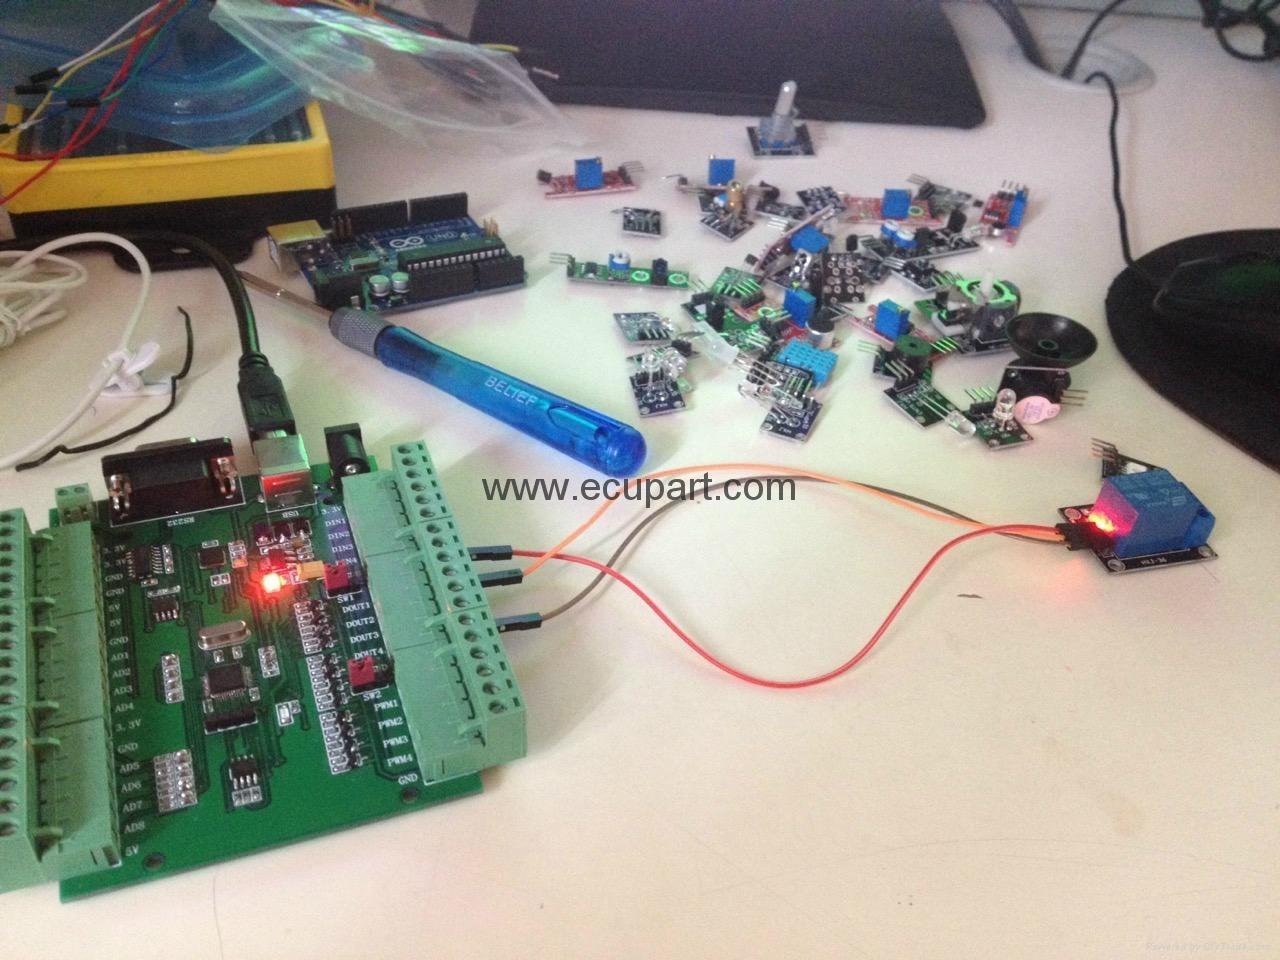 Sensor acquisition board, sensor acquisition card